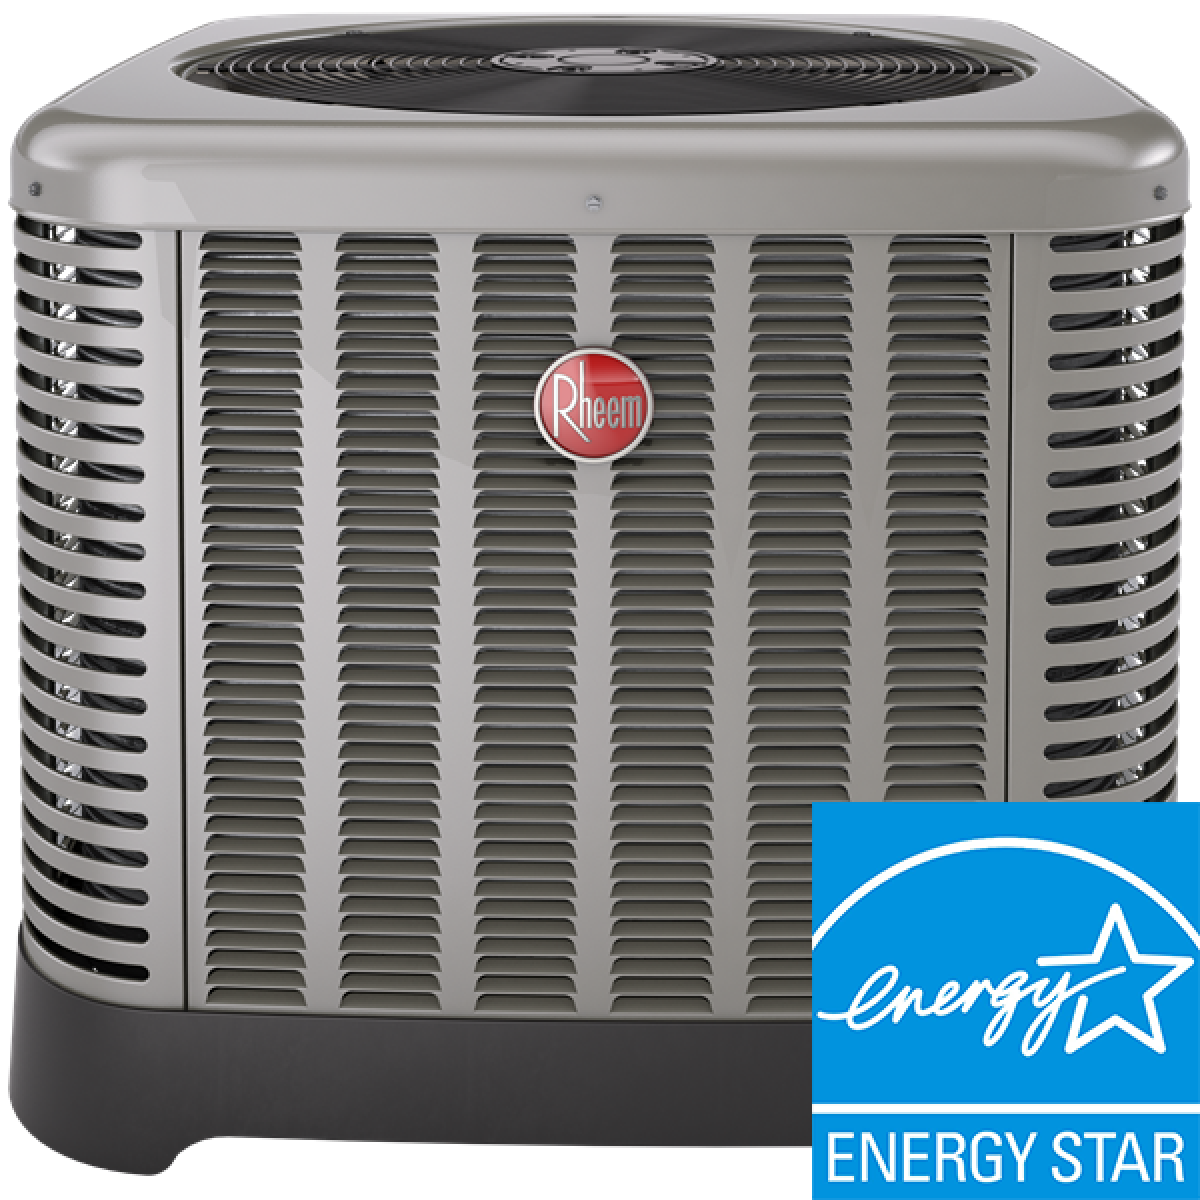 2 5 Ton Rheem 14 Seer Ra14 Classic 174 Series Air Conditioner